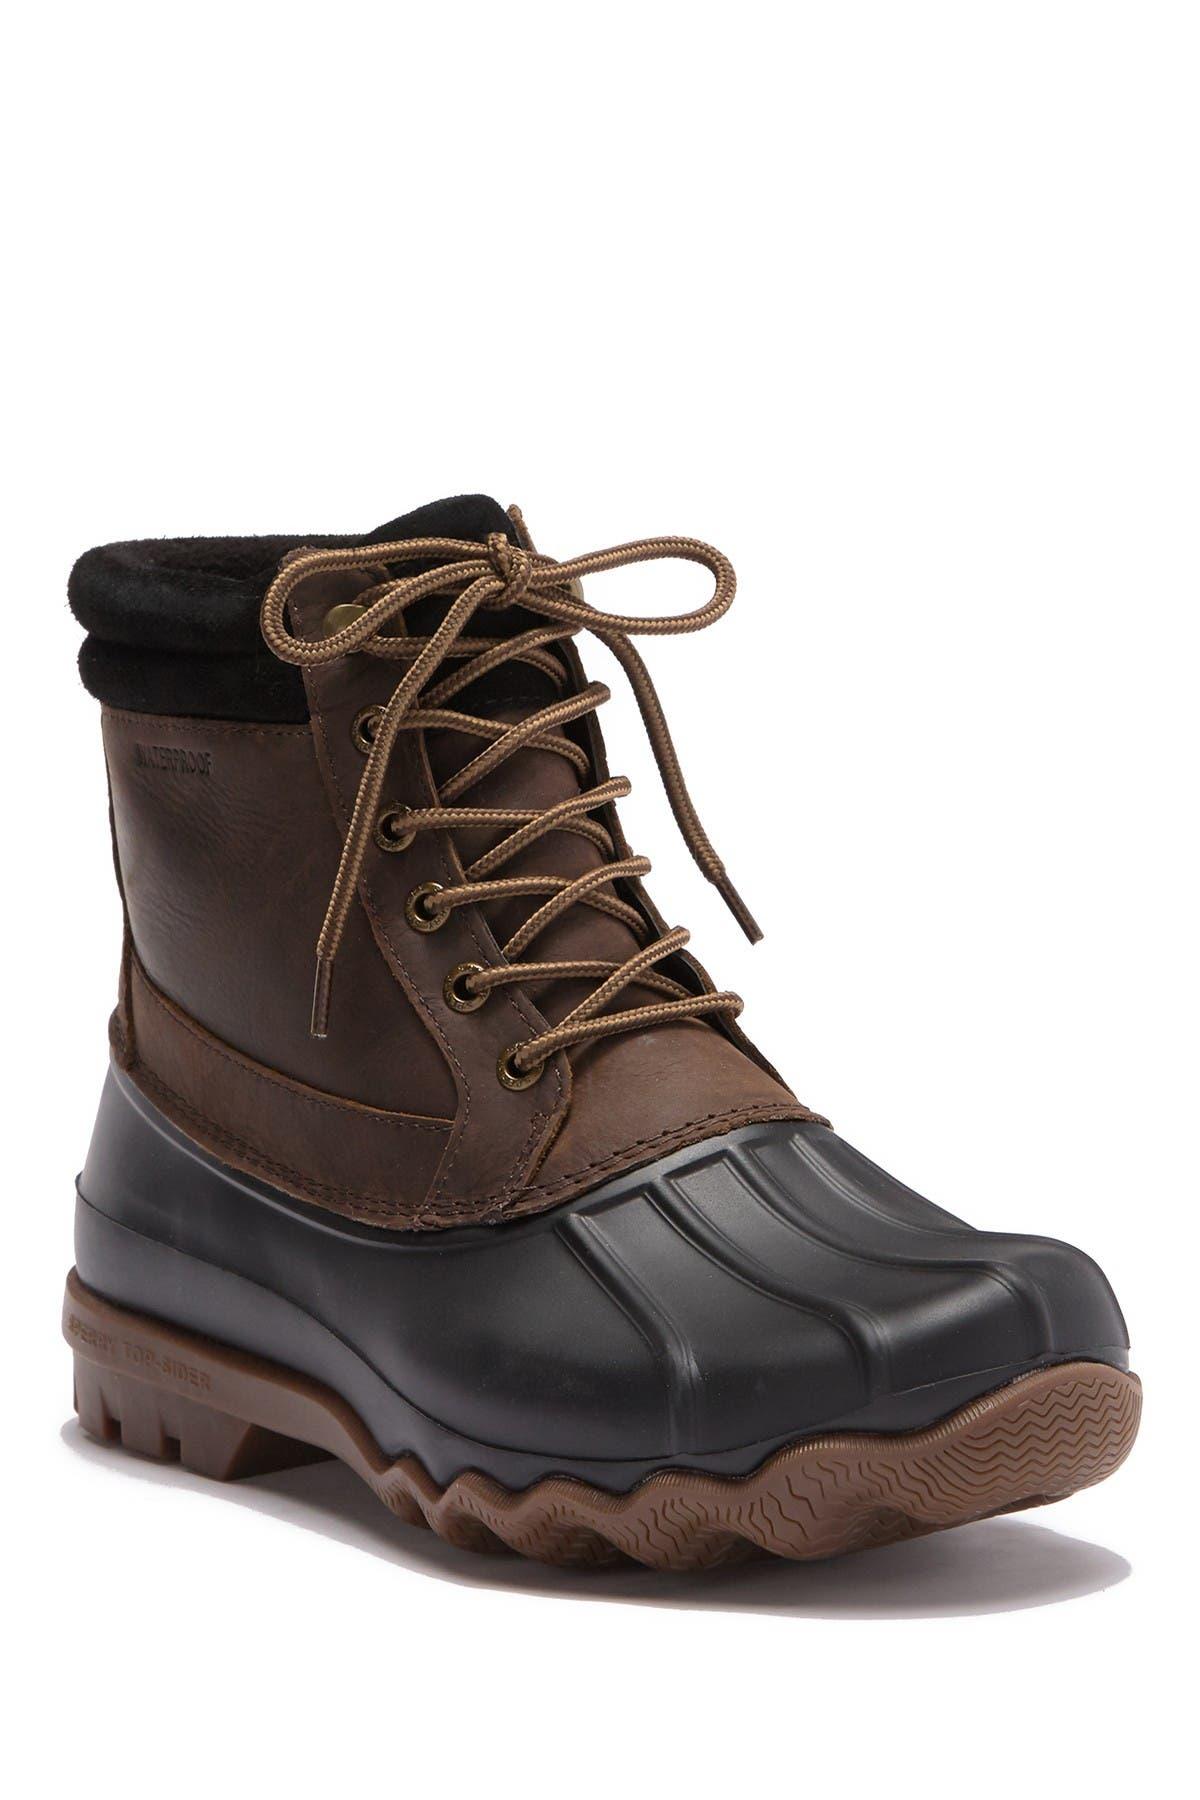 Sperry | Brewster Waterproof Duck Boot